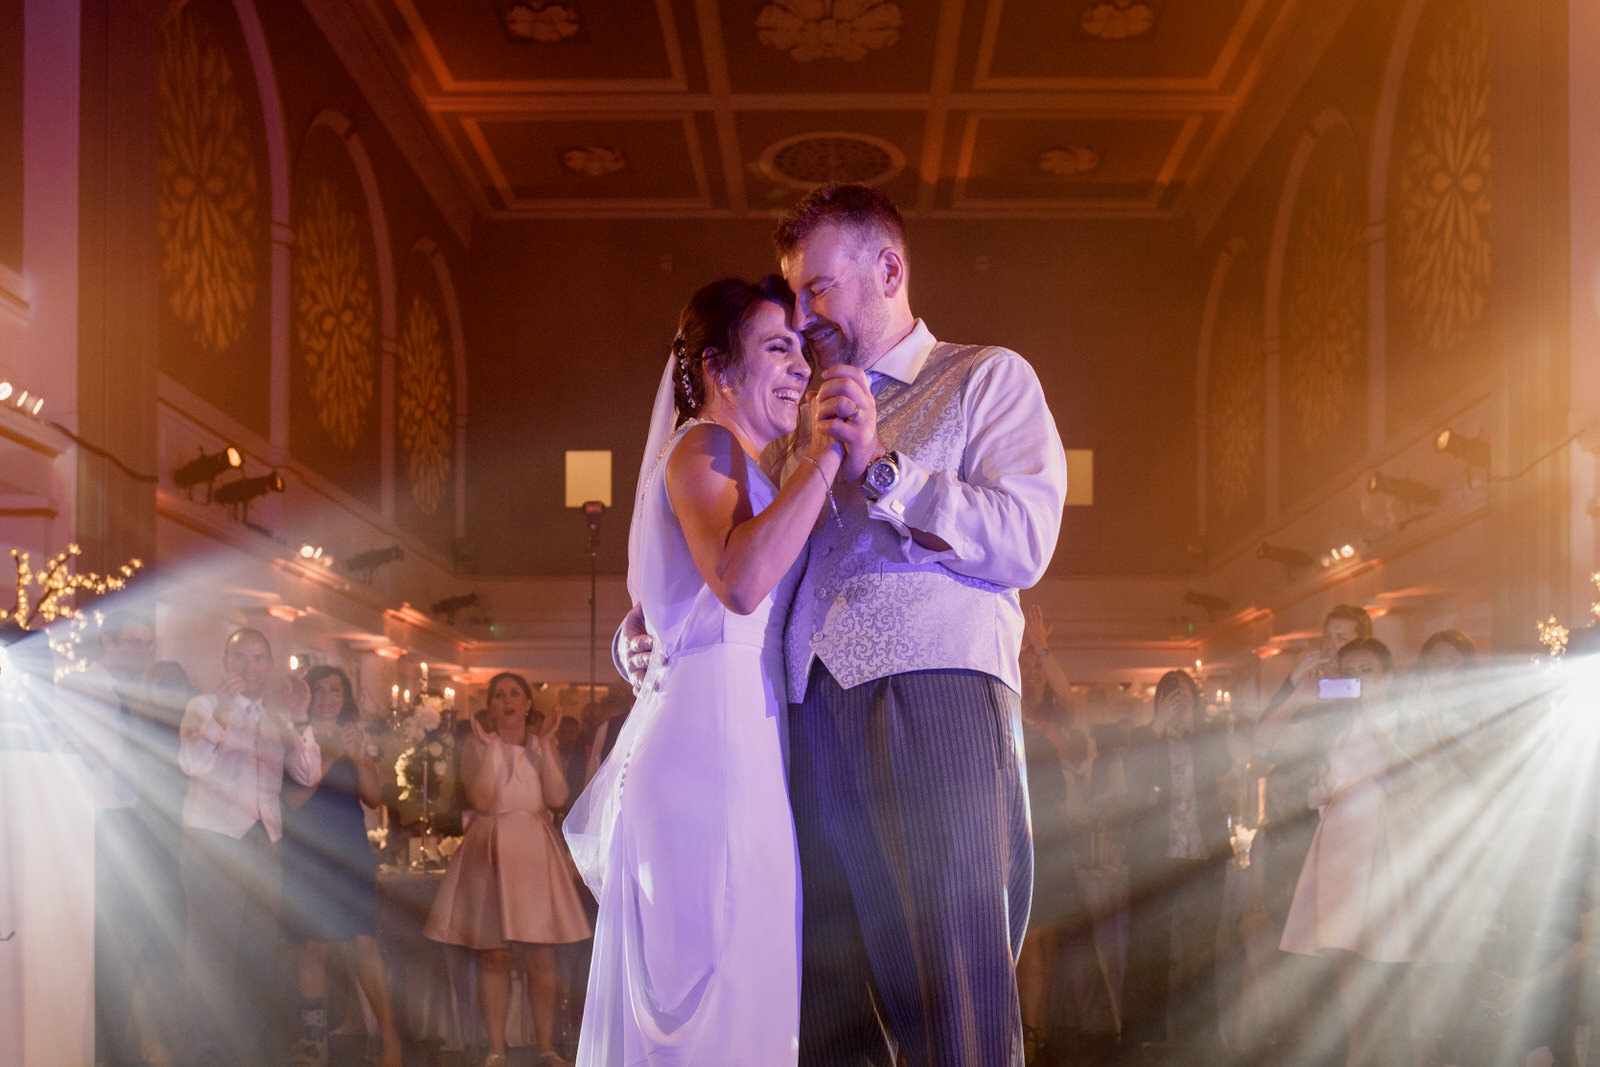 first dance at wedding in one marylebone